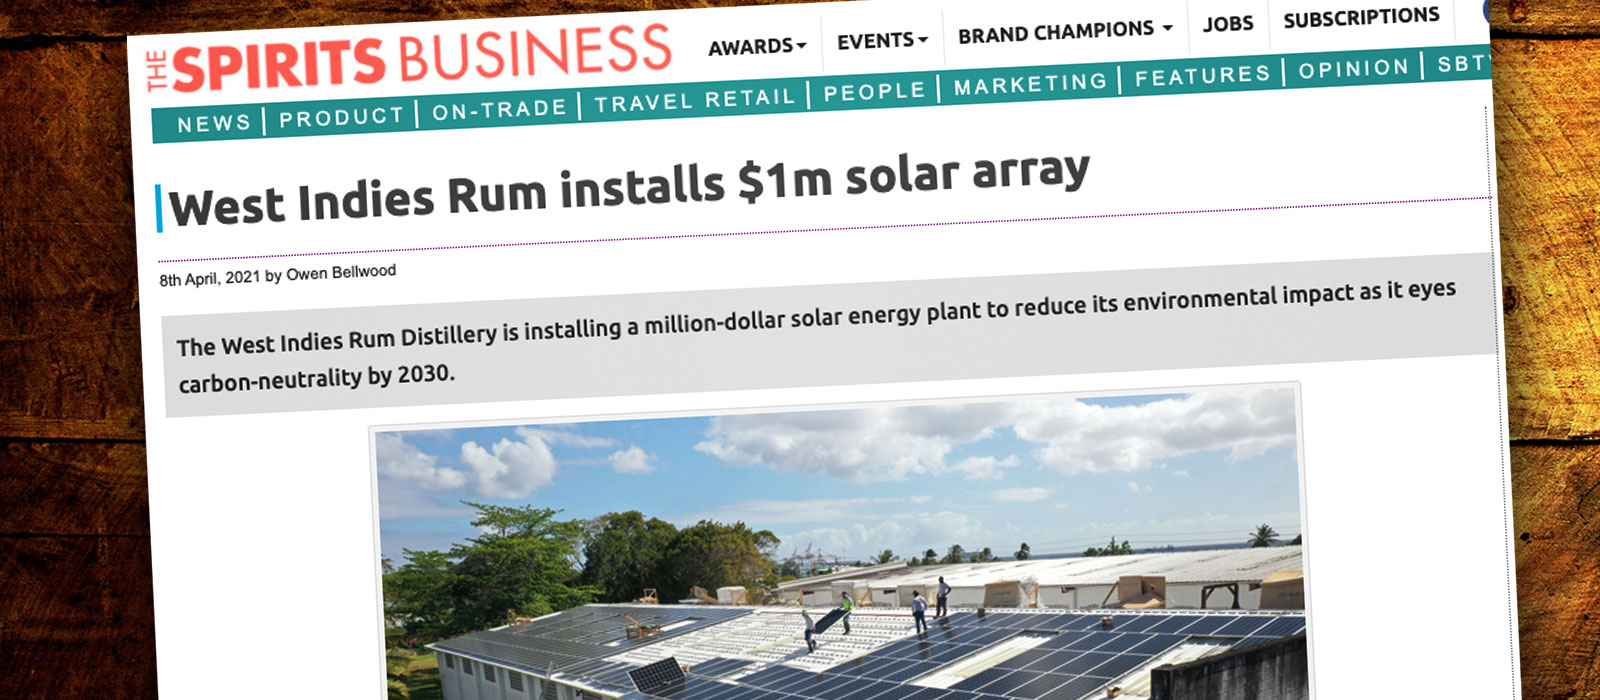 West Indies Rum Distillery installerar solceller